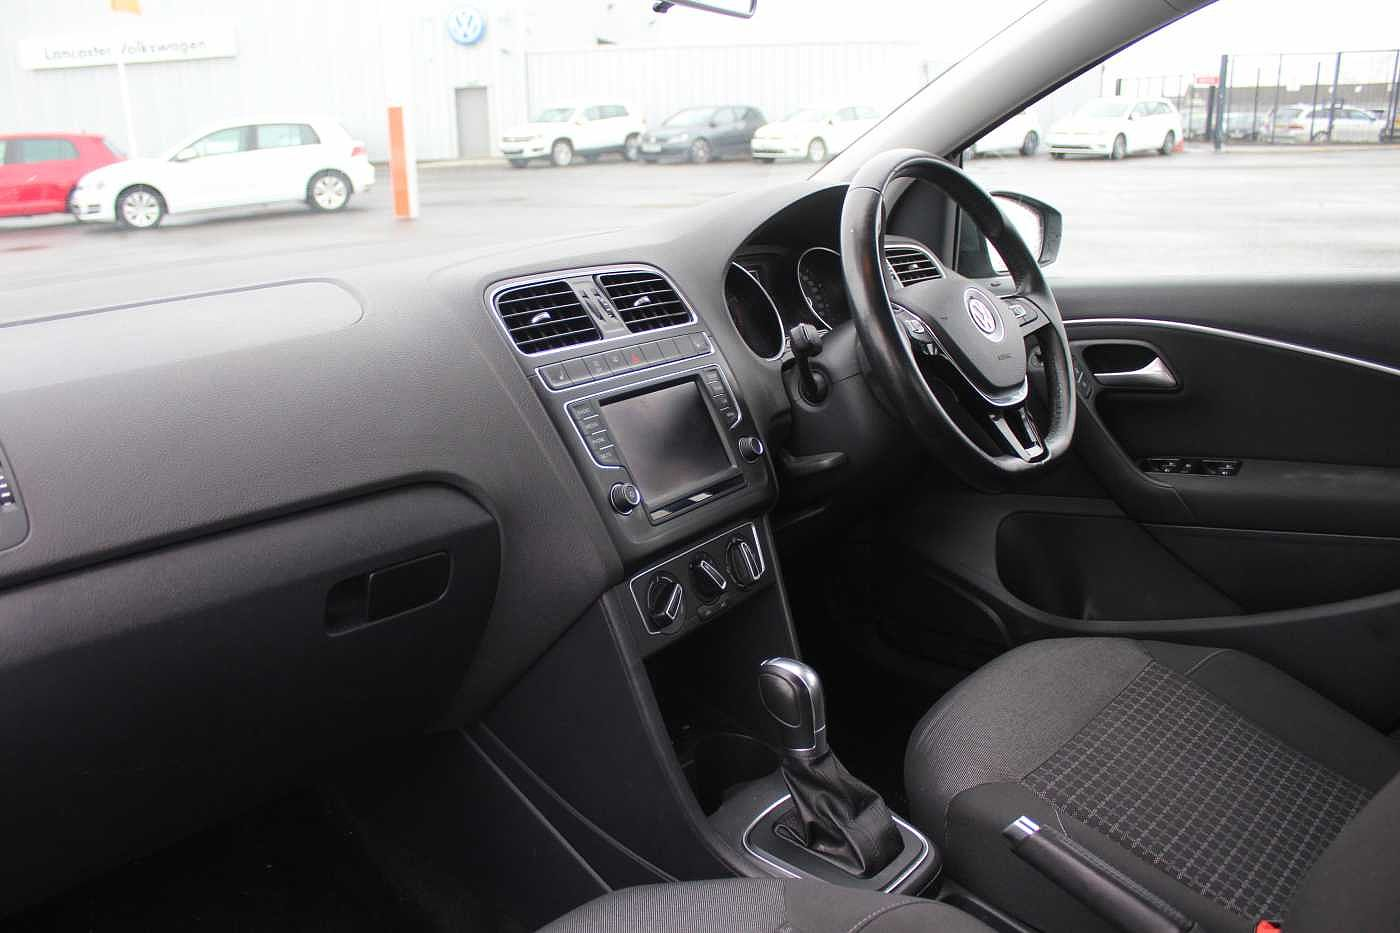 Volkswagen Polo 1.2 TSI SE 90PS DSG 5Dr